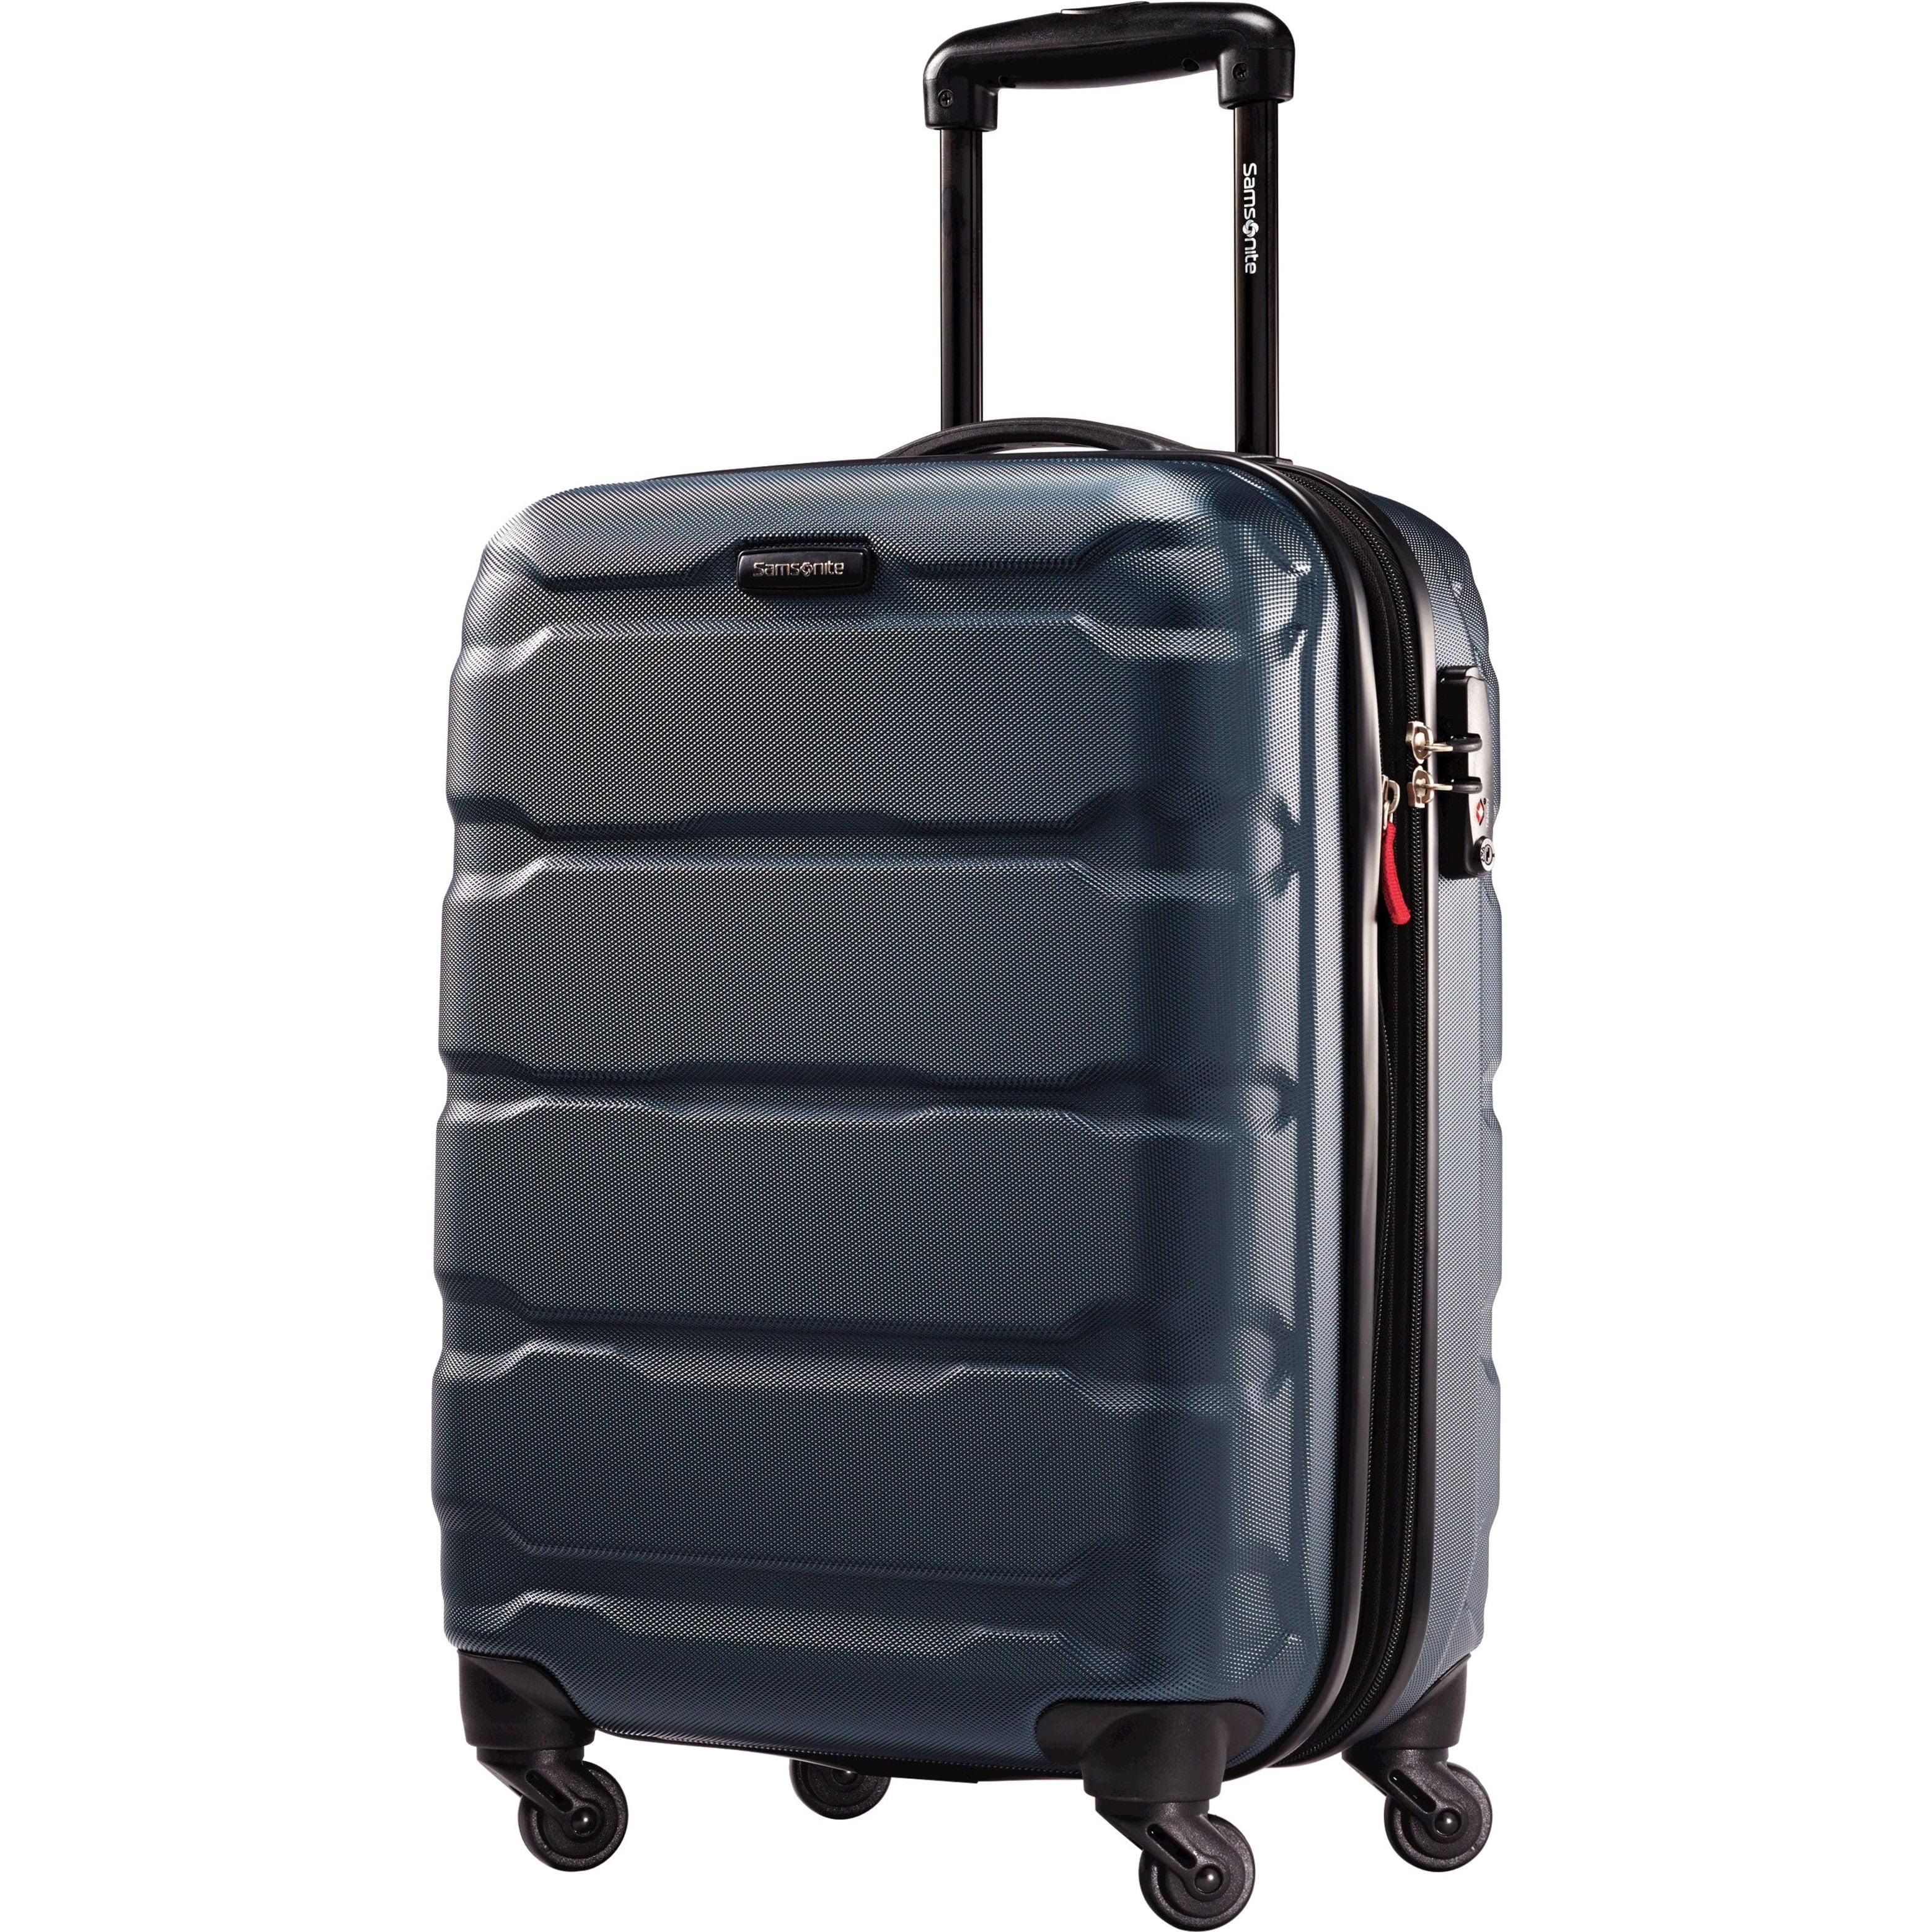 Samsonite Omni Travel/Luggage Case (Roller) Travel Essential, Teal